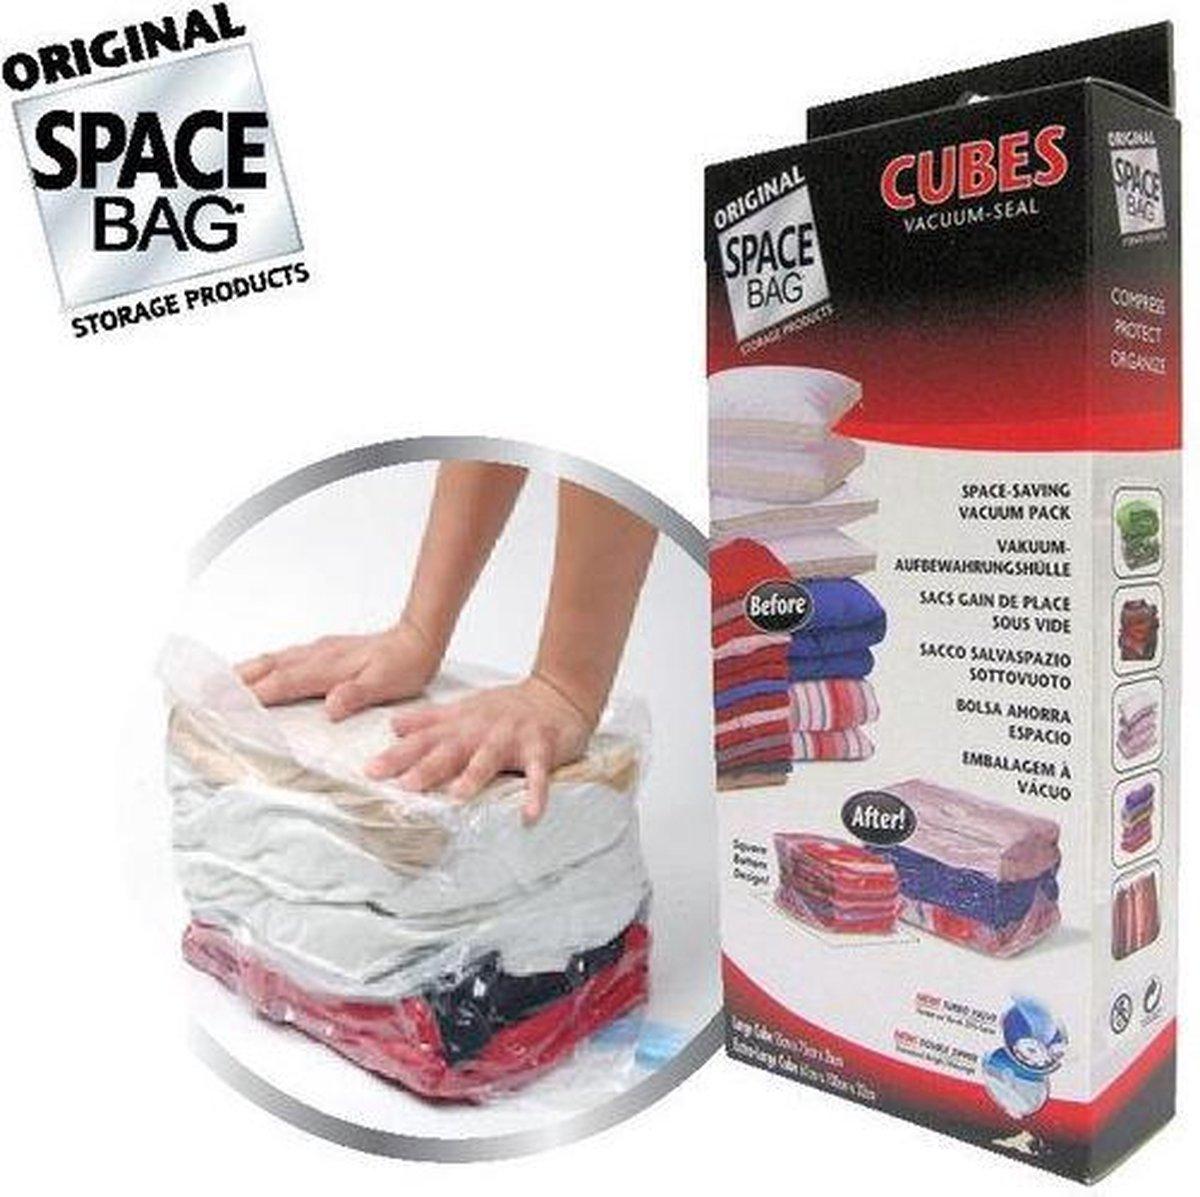 Space Bag Cubes (2 stuks) Vacuum Opbergzakken - Space Bag